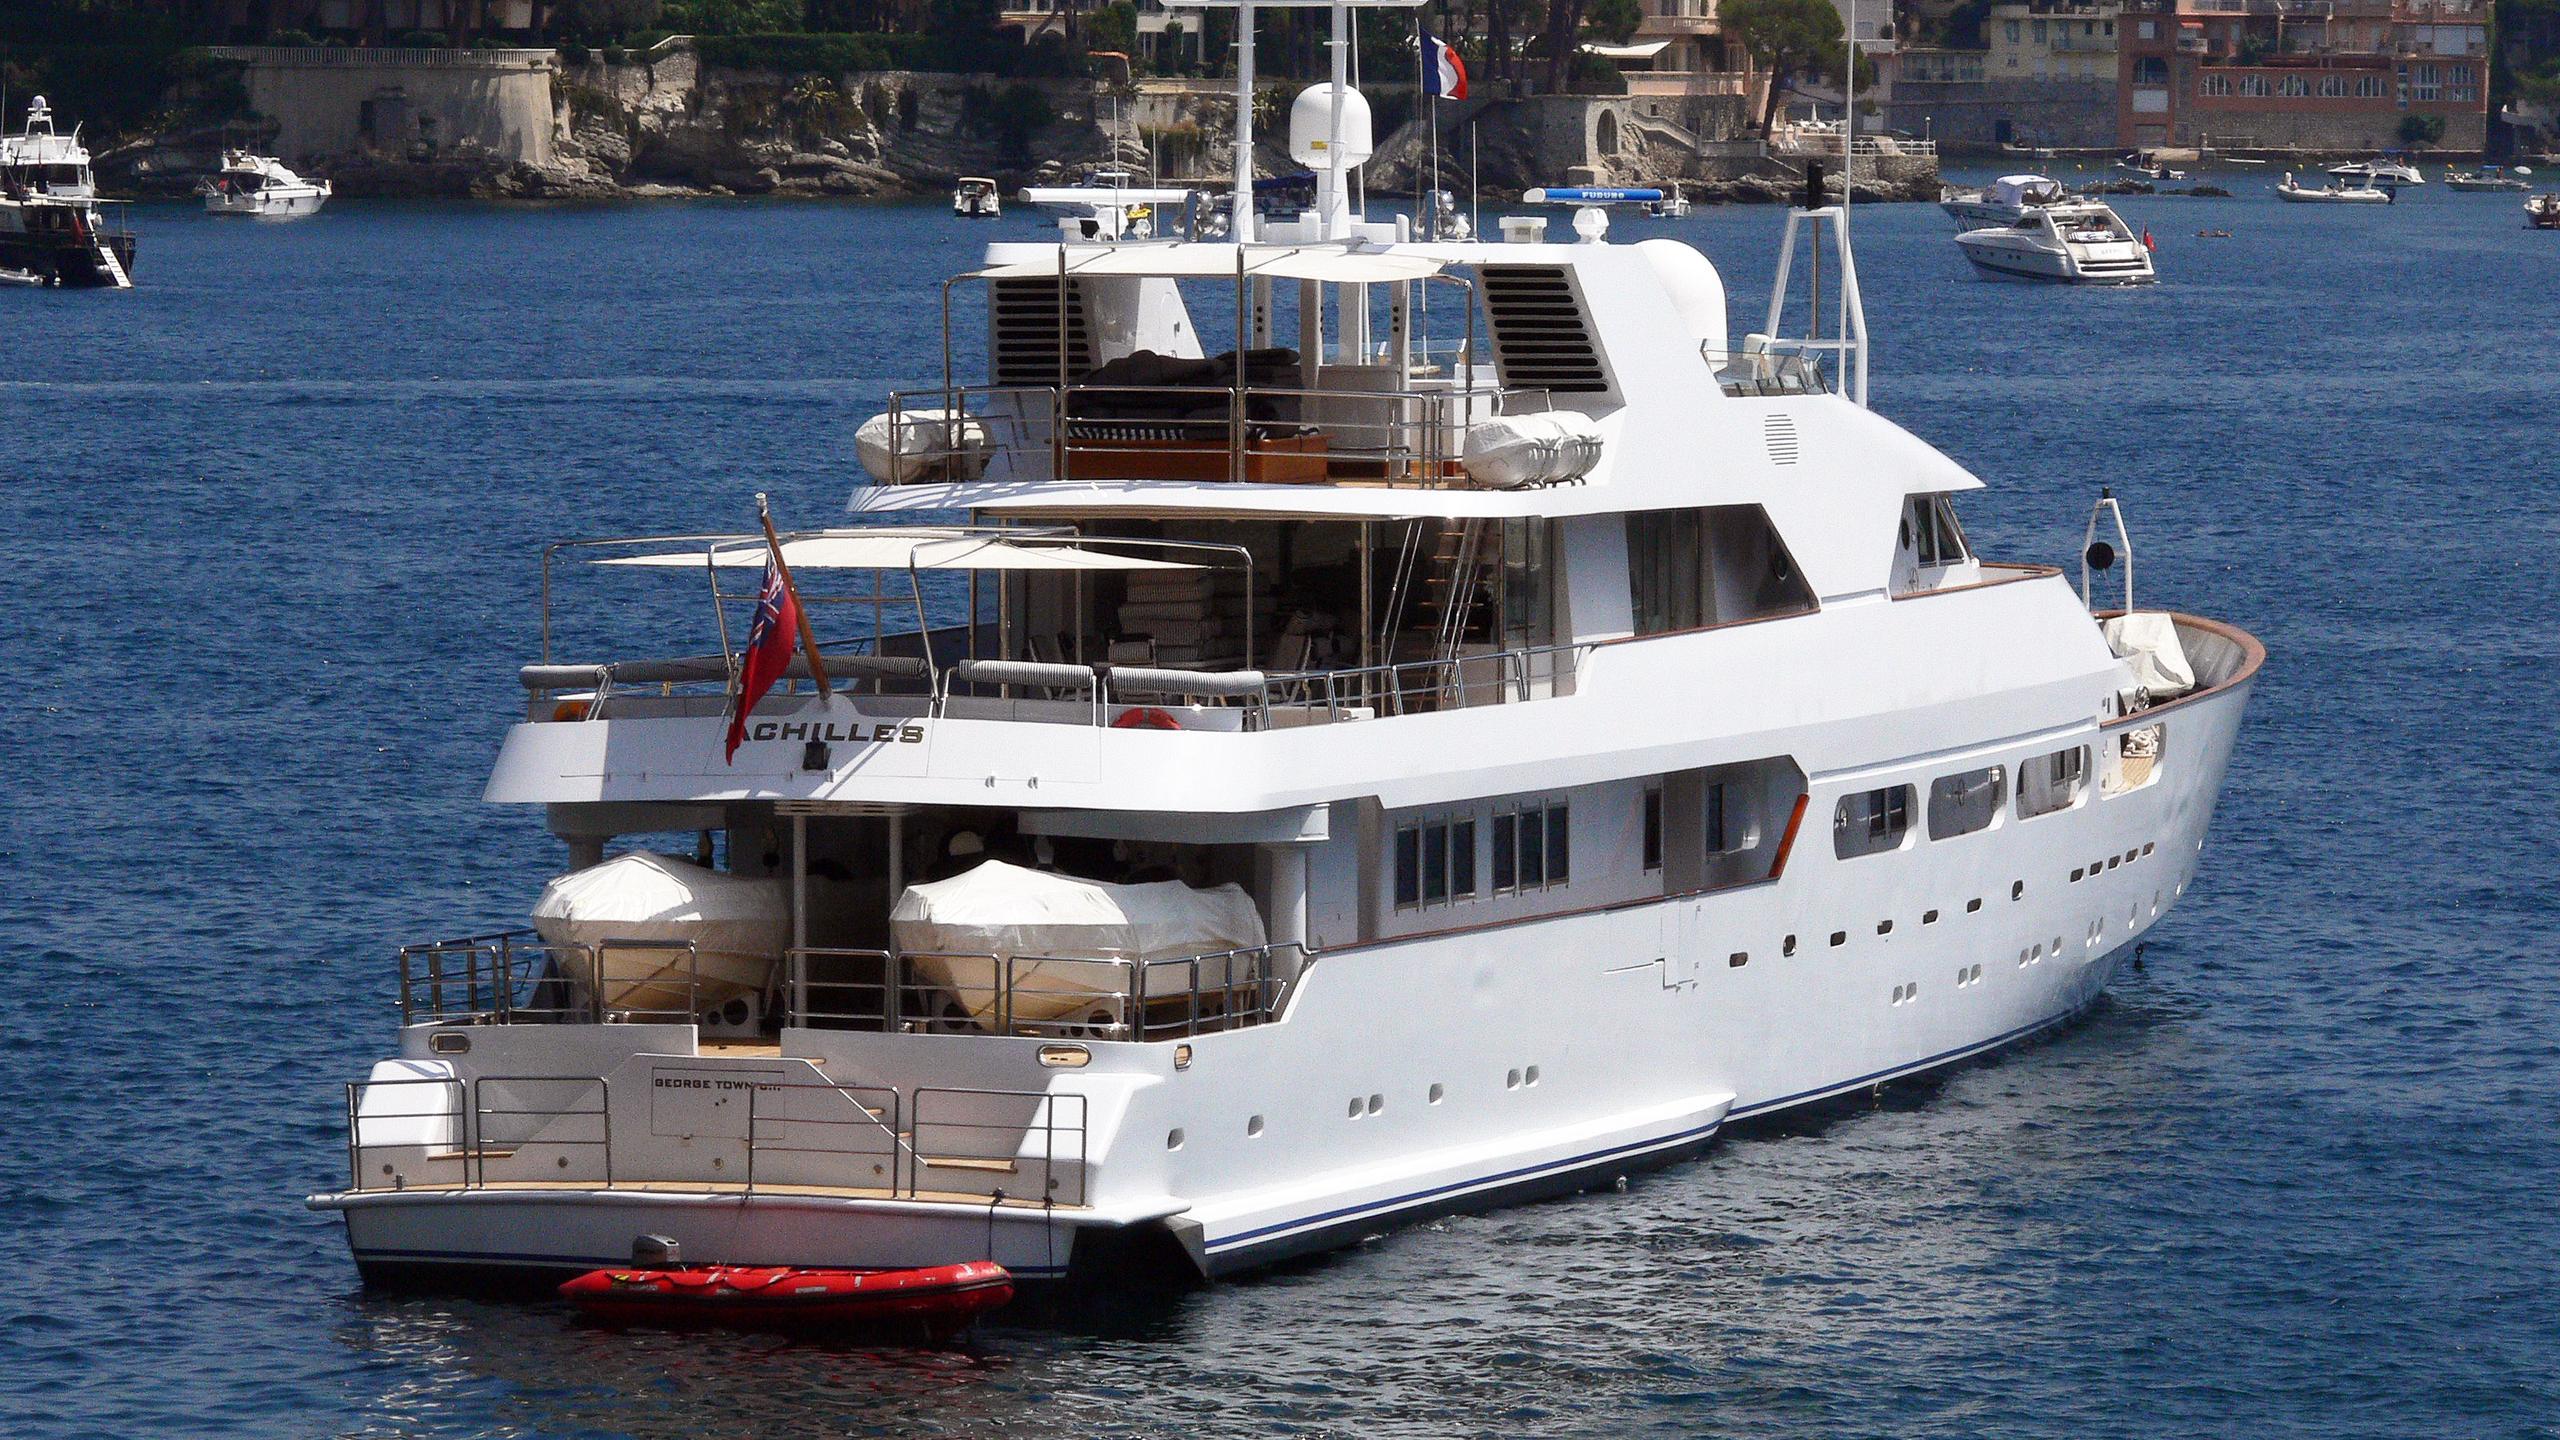 achilles-motor-yacht-crn-1984-55m-stern